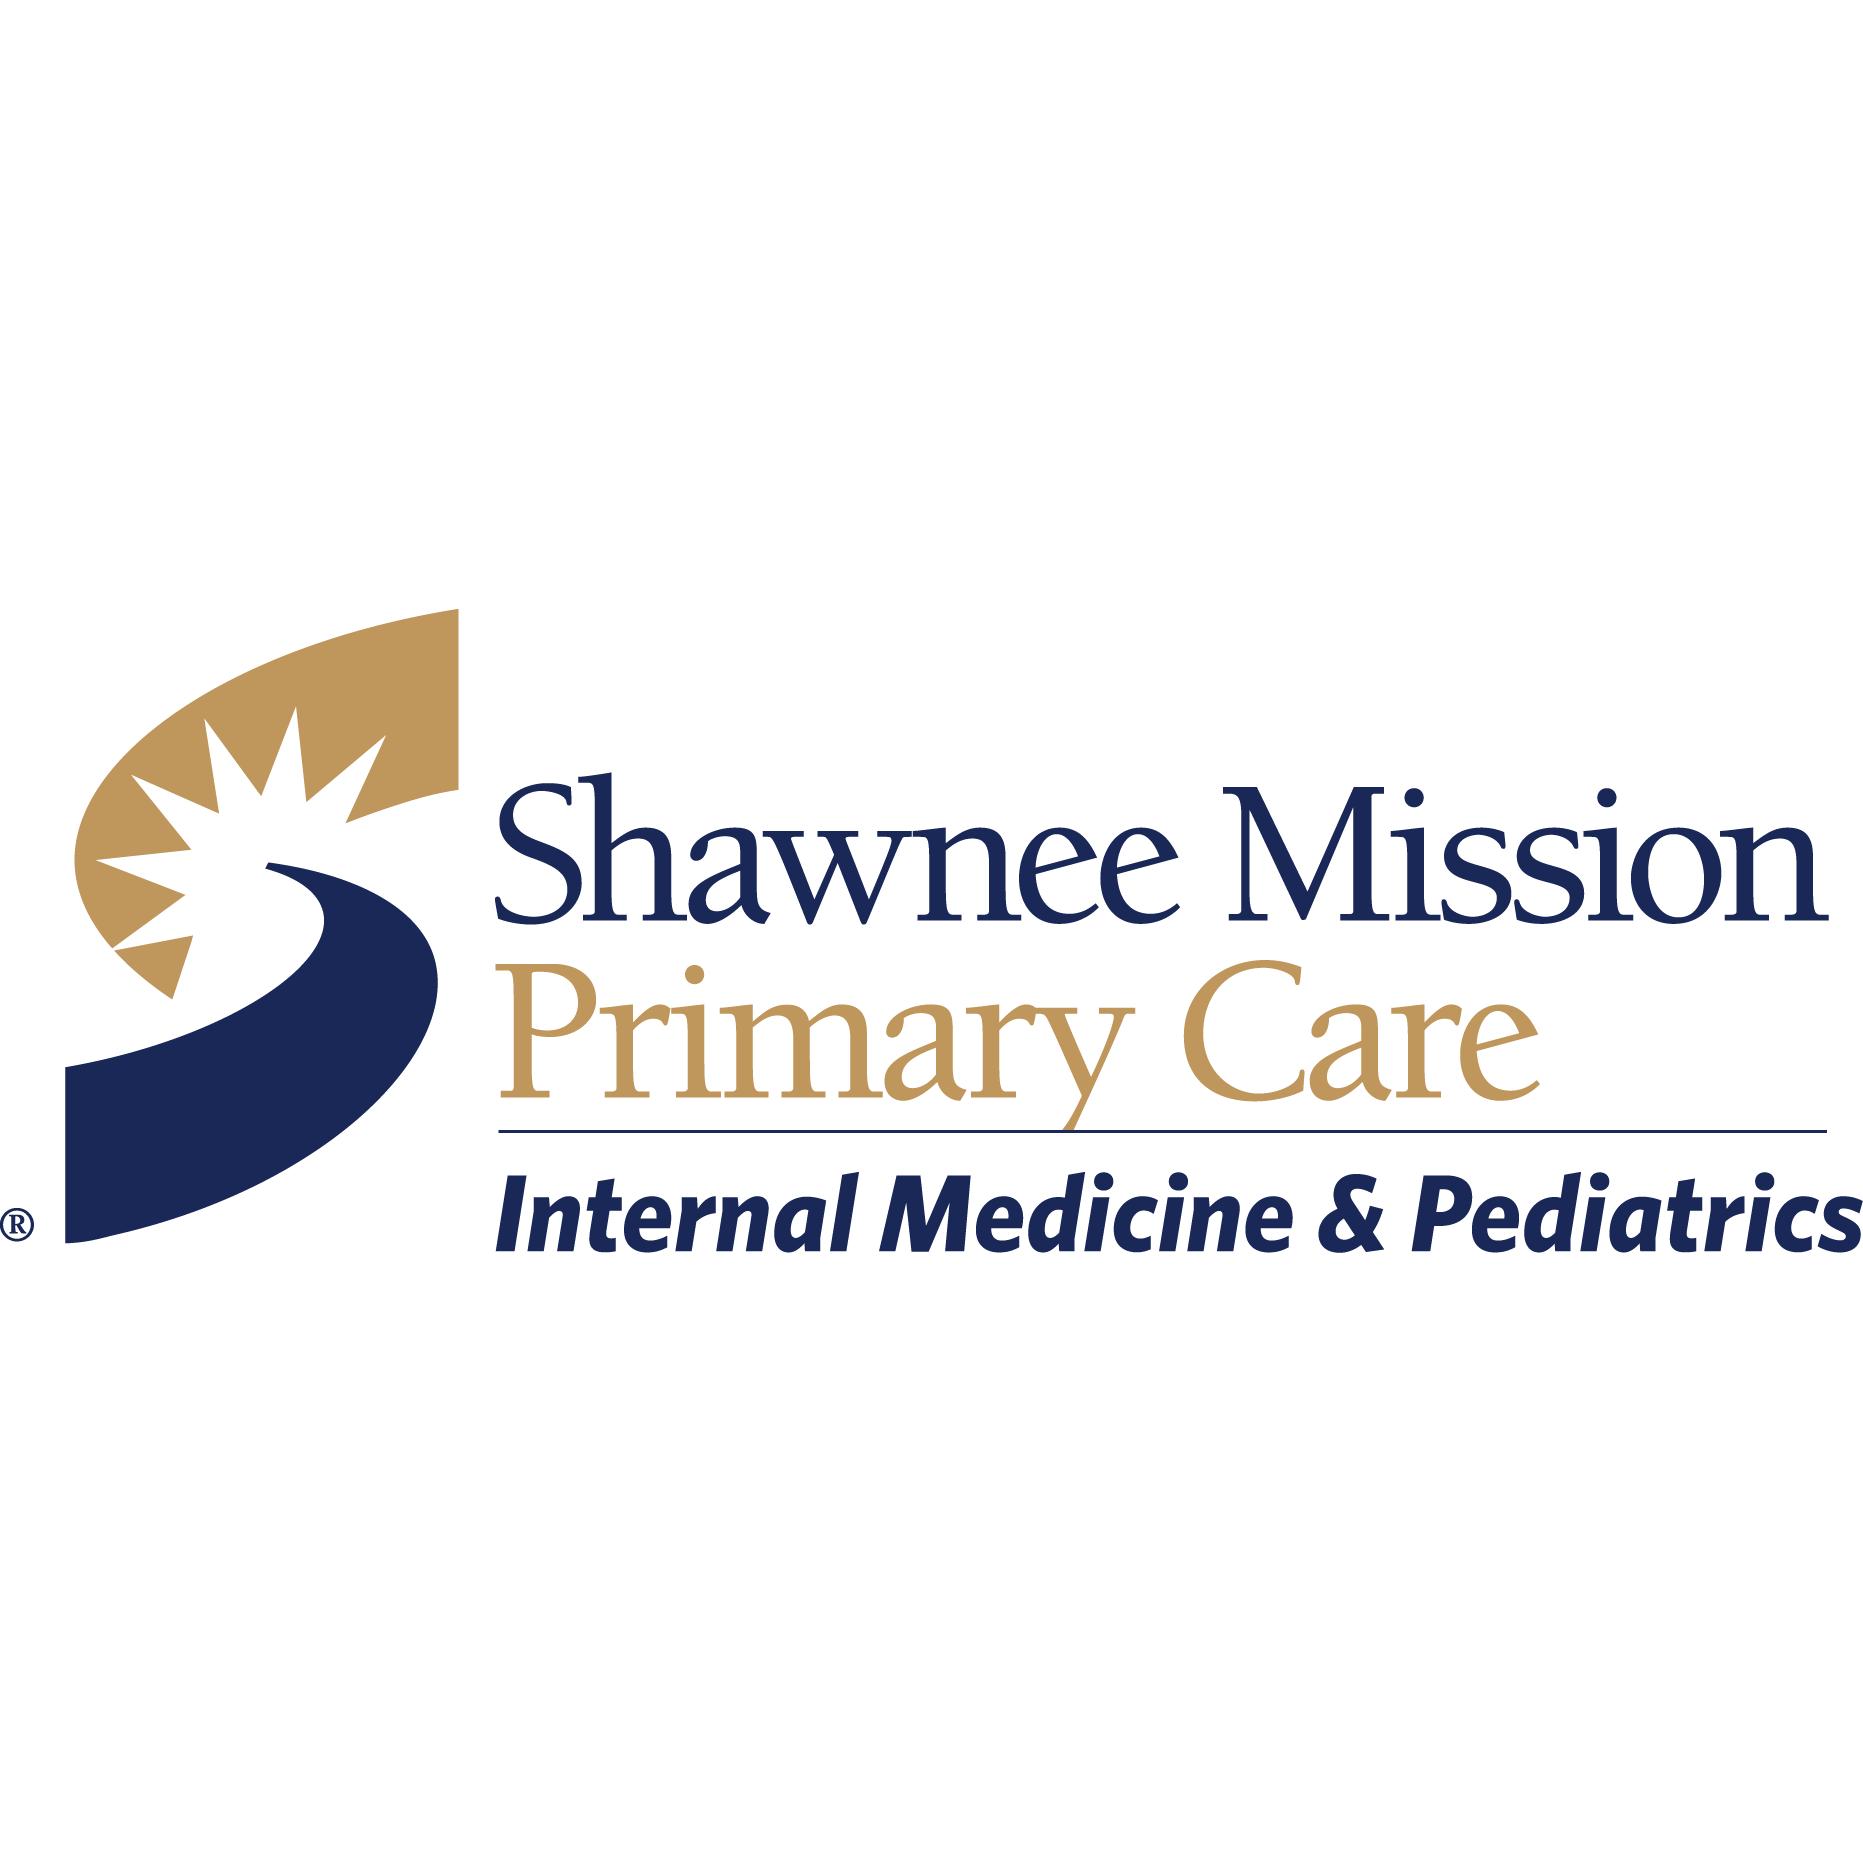 Shawnee Mission Primary Care - Internal Medicine & Pediatrics image 1